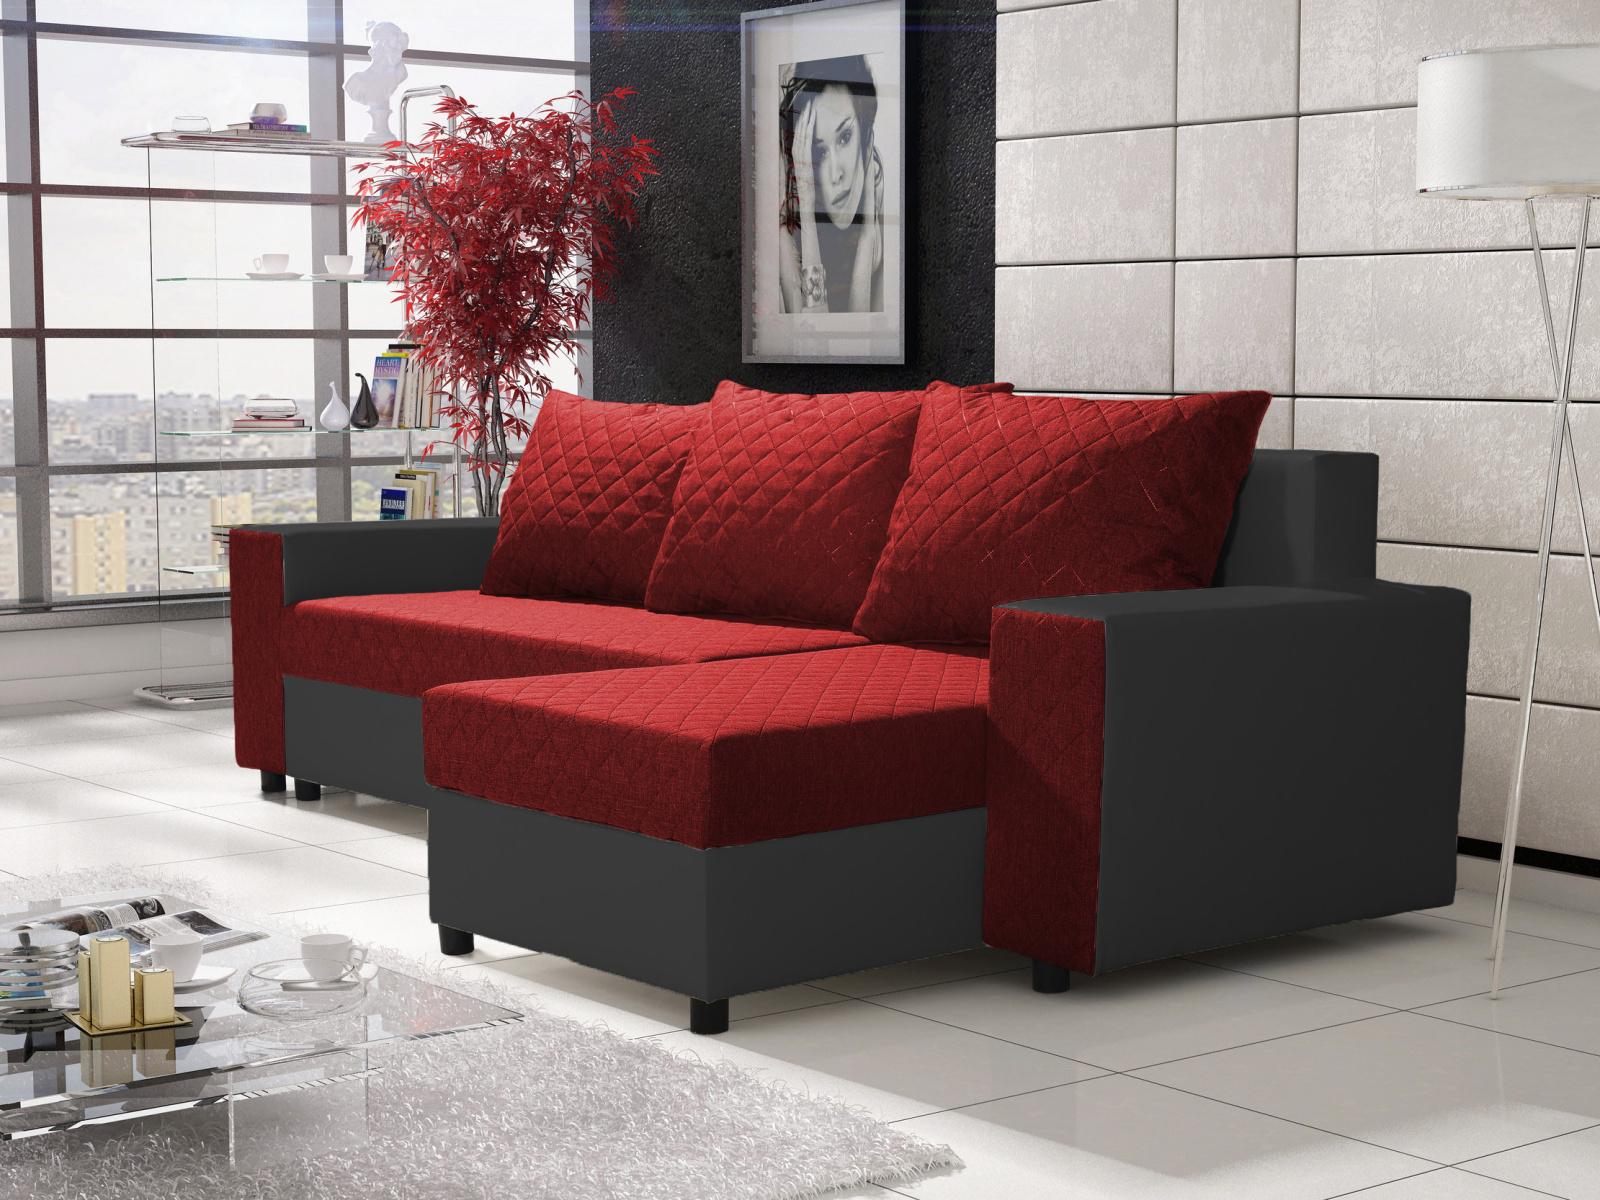 Smartshop Rohová sedačka FIESTA 6, červená látka/černá ekokůže